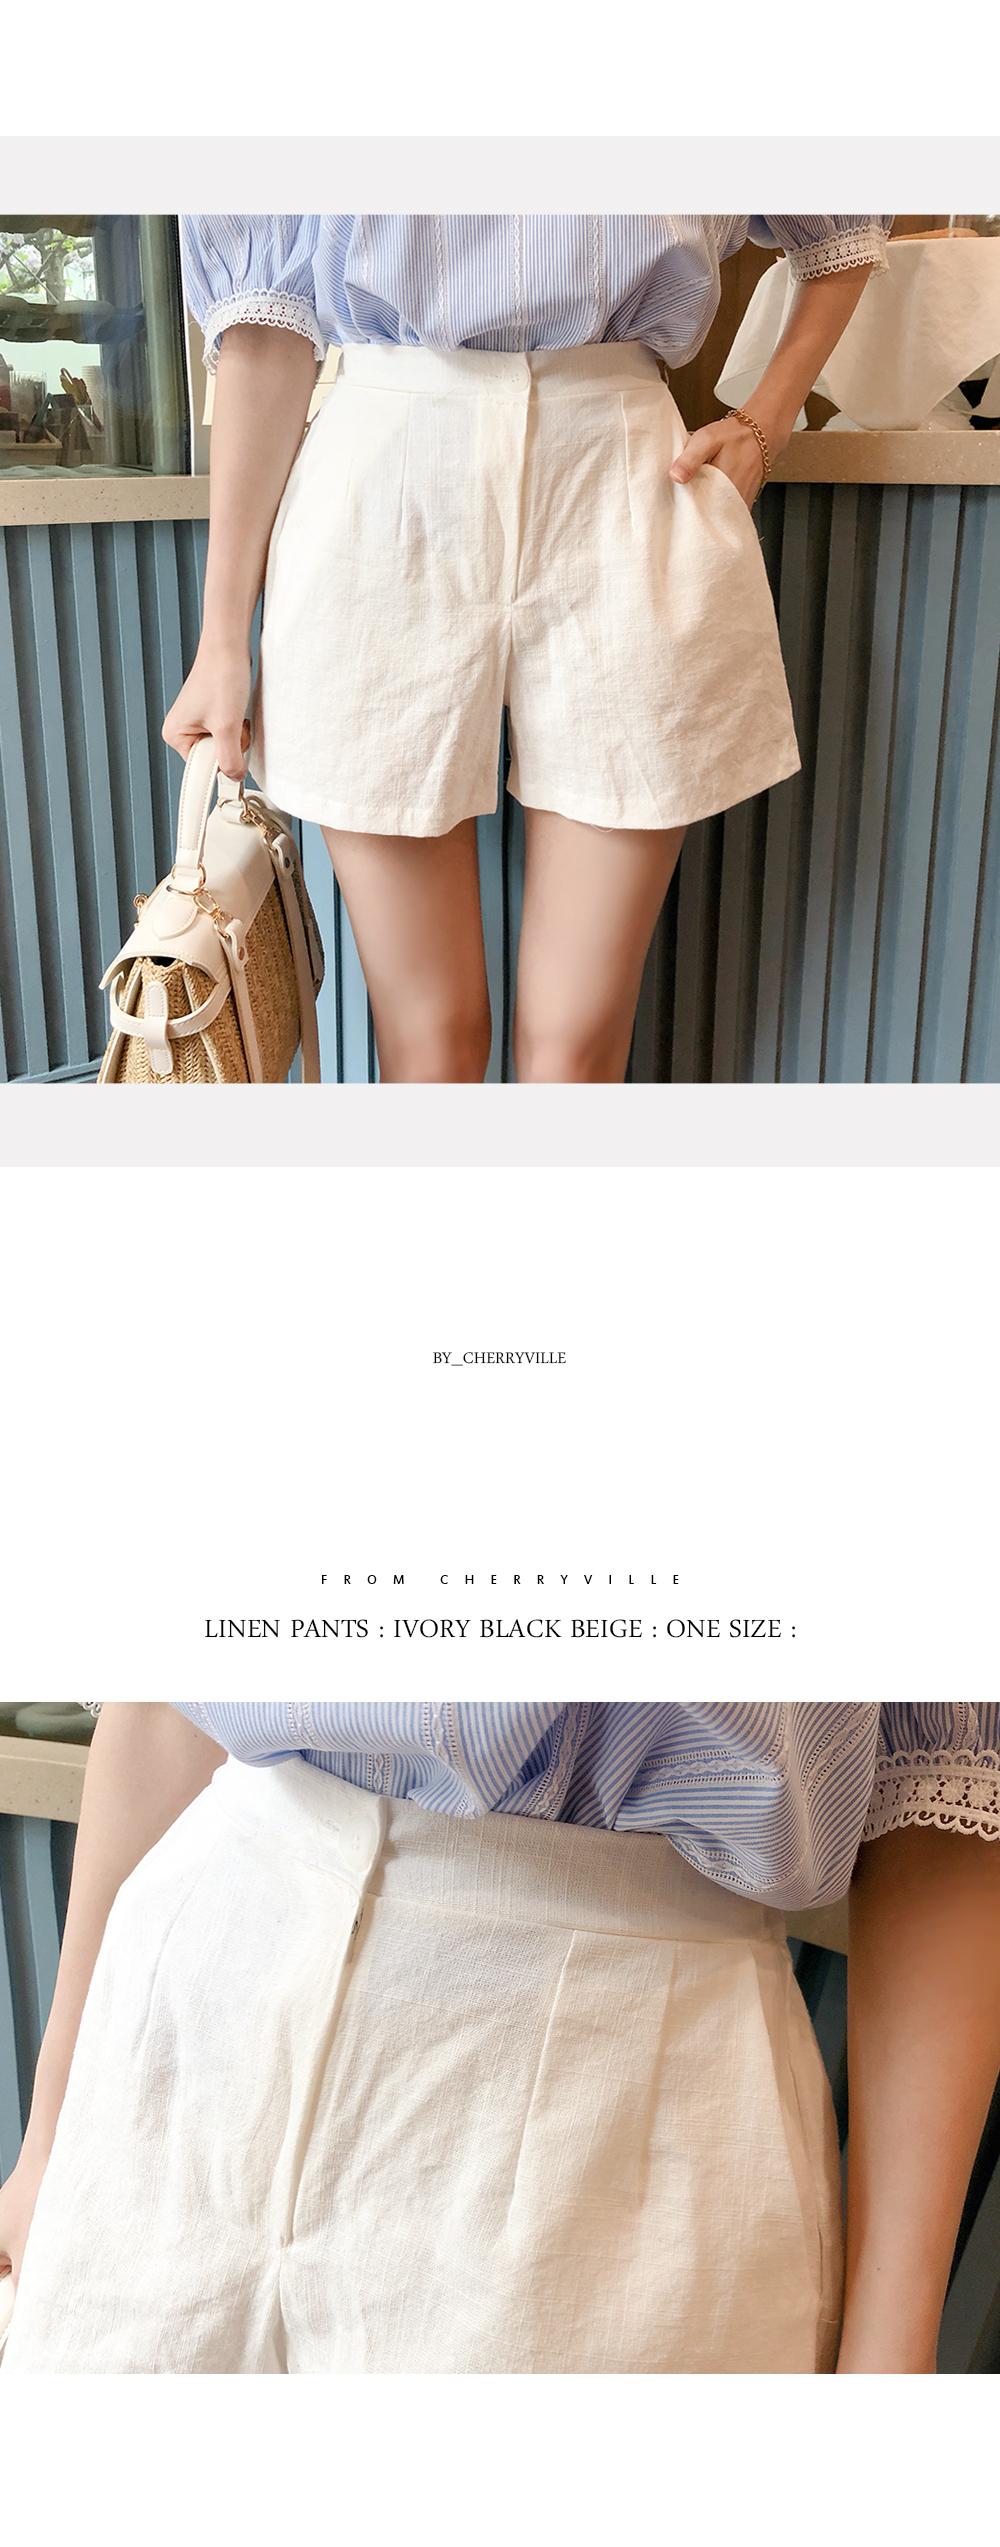 Each linen pants